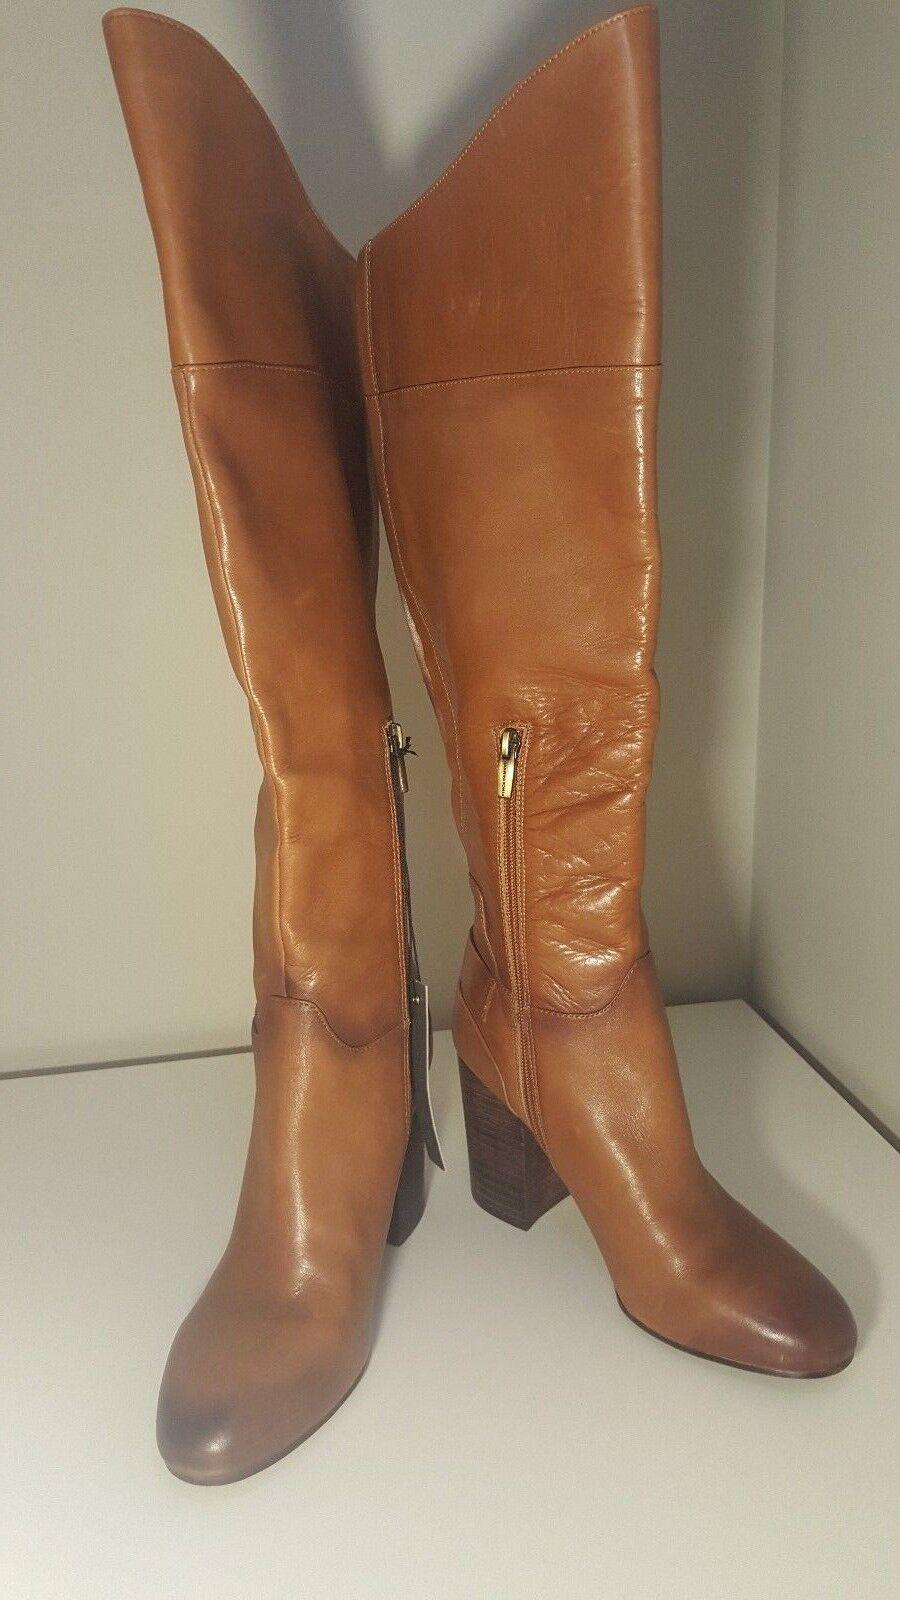 VINCE CAMUTO SIDNEY block heel tall boot 8.5